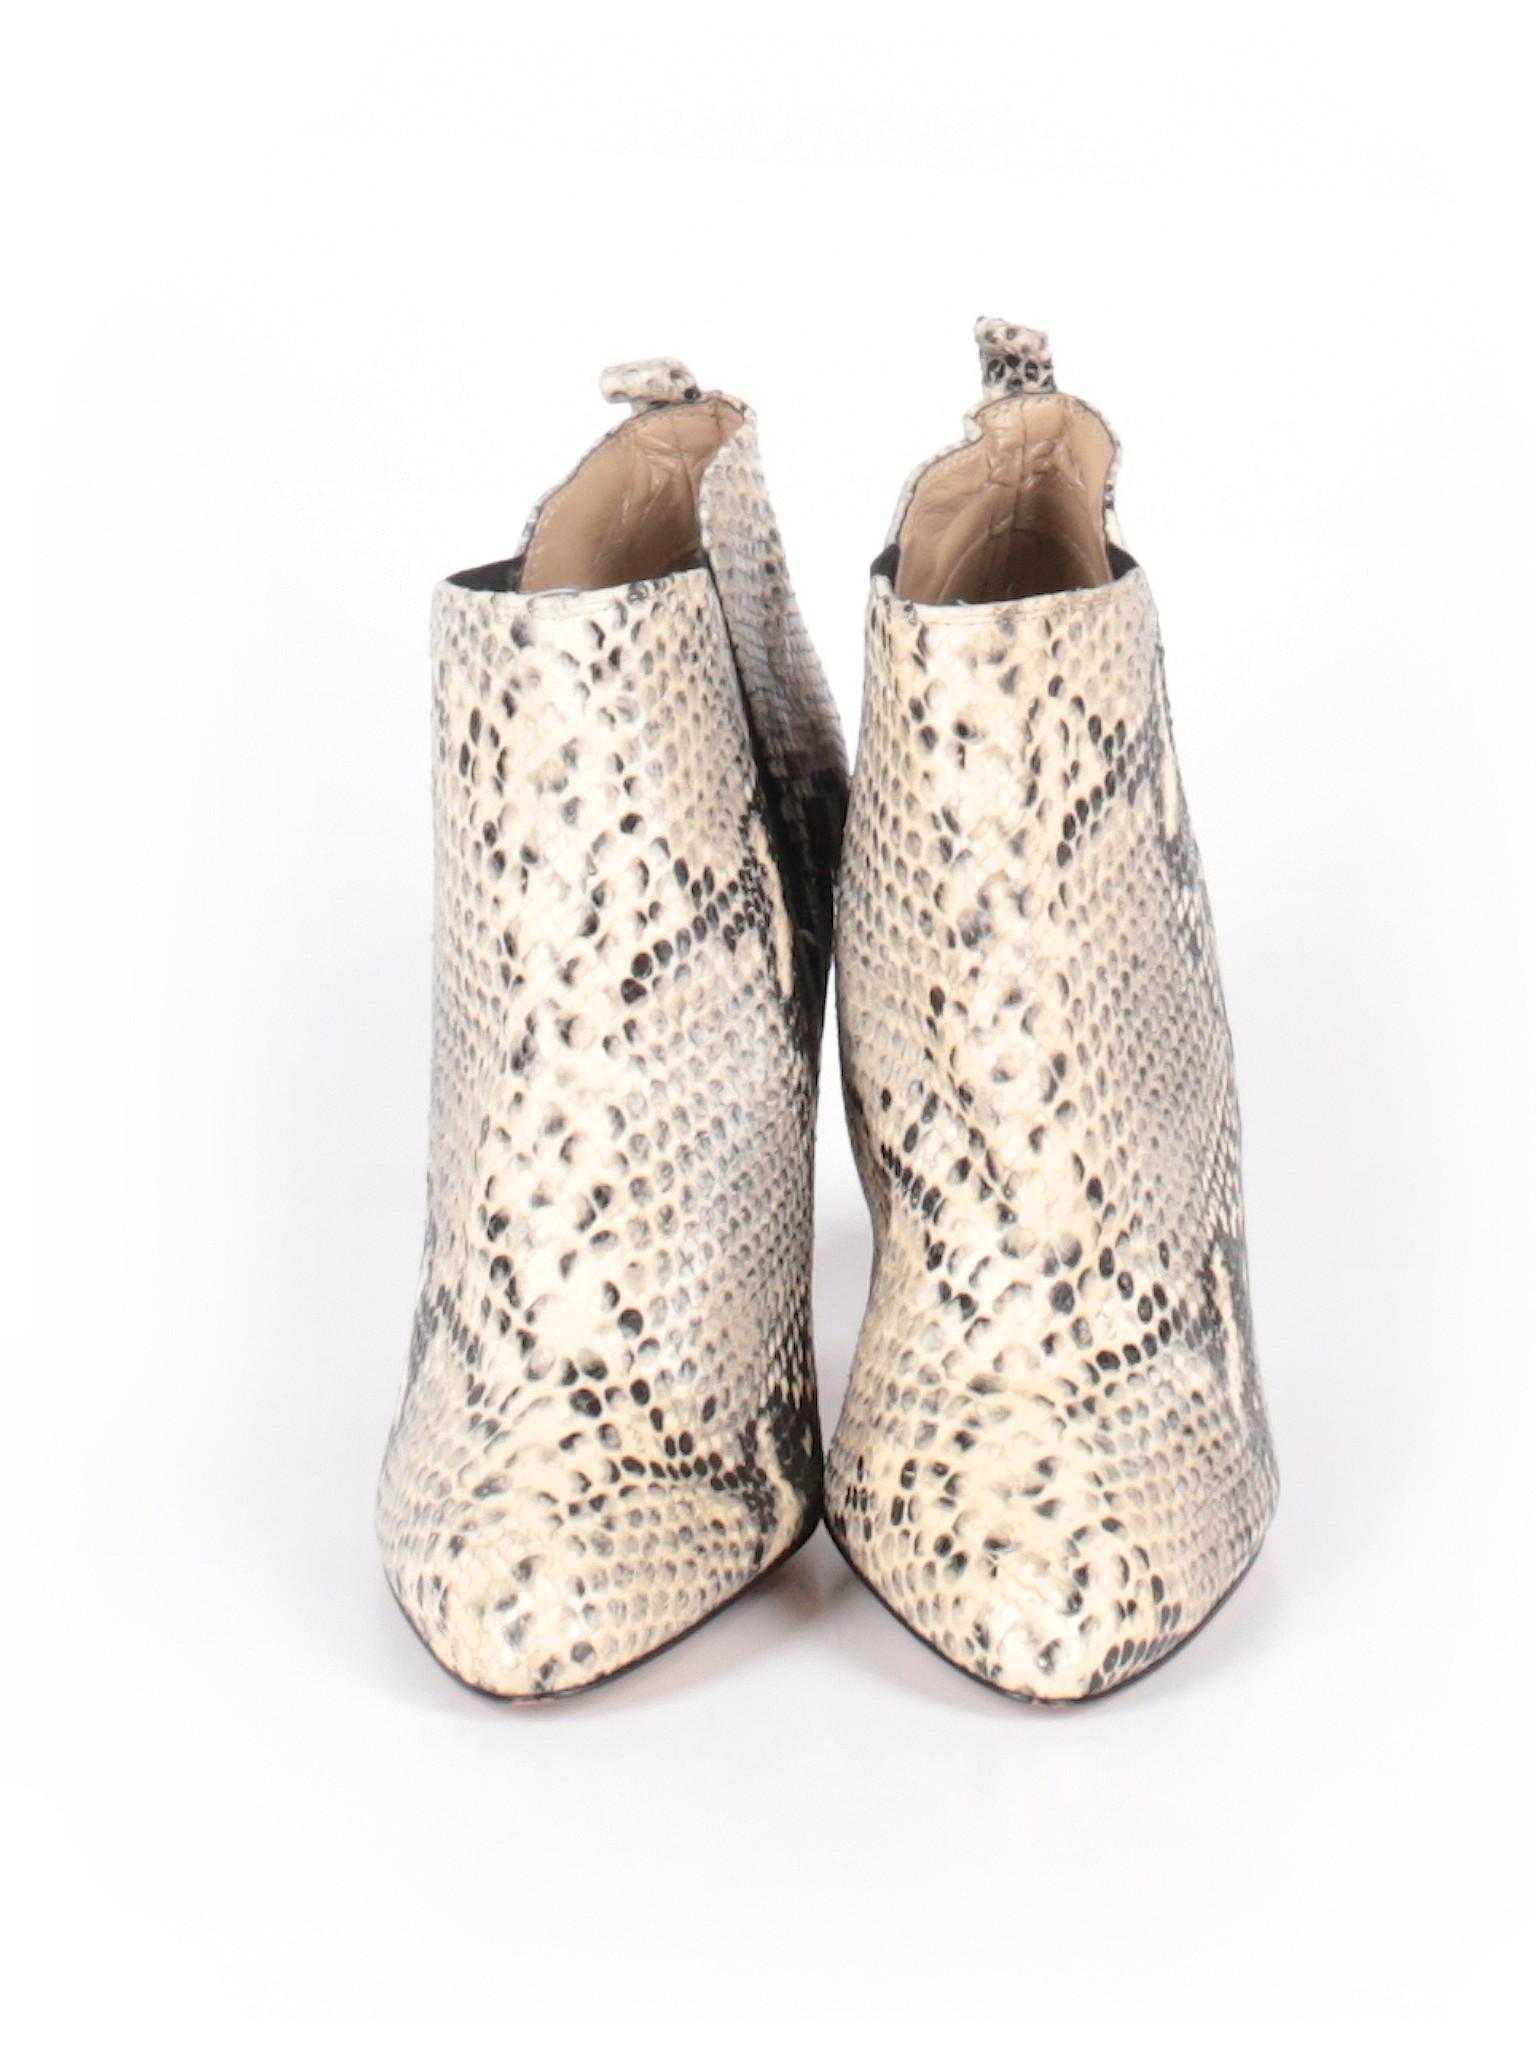 BCBGMAXAZRIA promotion Boots BCBGMAXAZRIA Boutique promotion Boutique Ankle Boots Ankle wREdFw